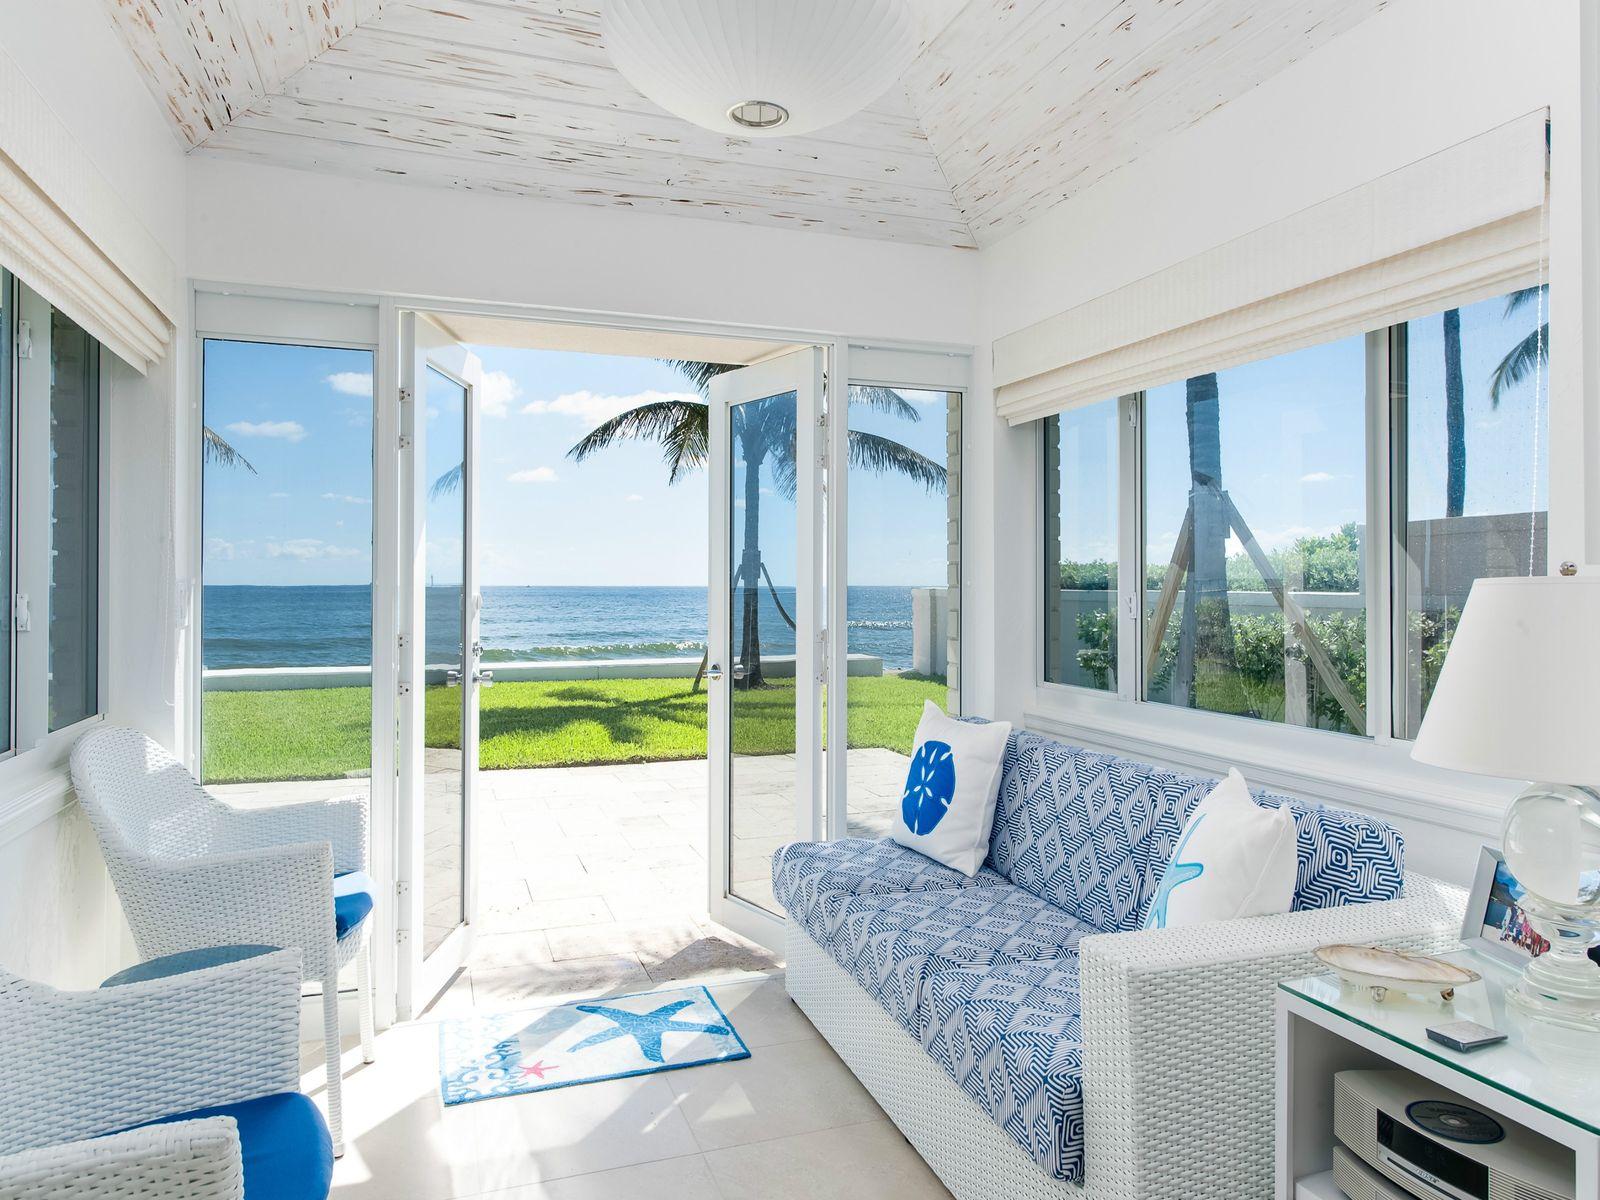 Beach Cabana Interior